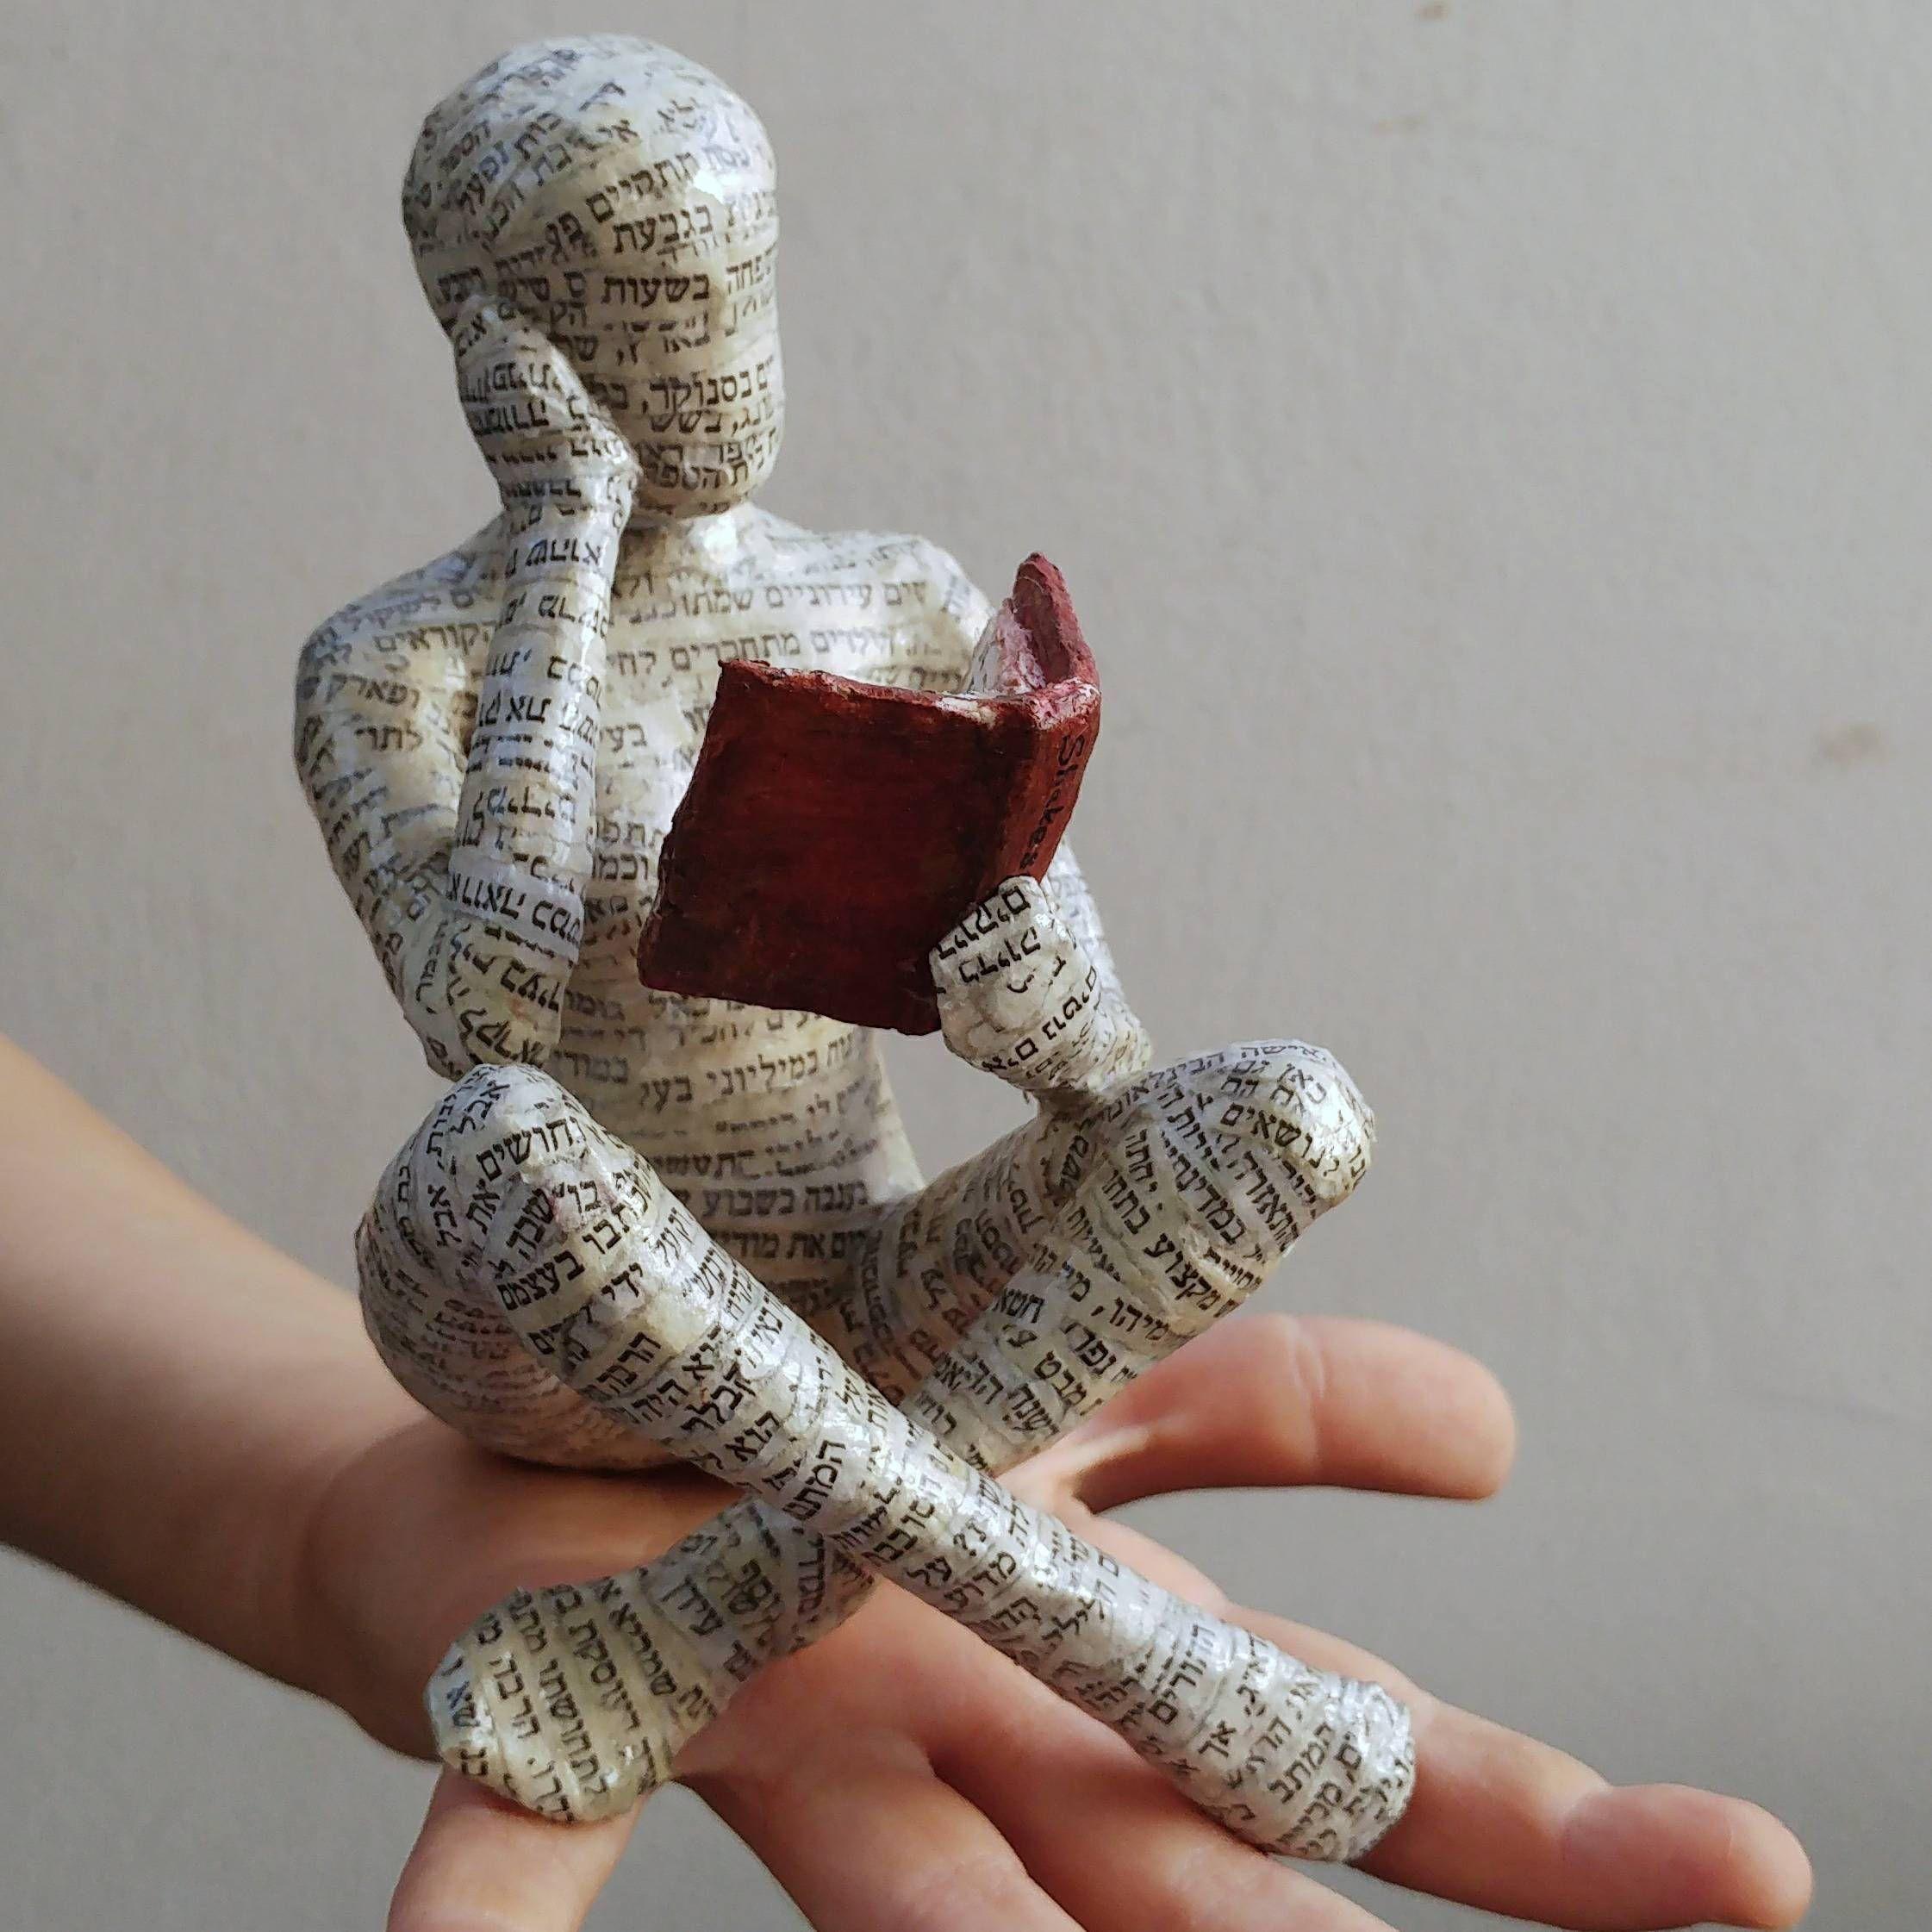 reading woman papier mache sculpture collectible item ooak sculpture shelf decor cross. Black Bedroom Furniture Sets. Home Design Ideas